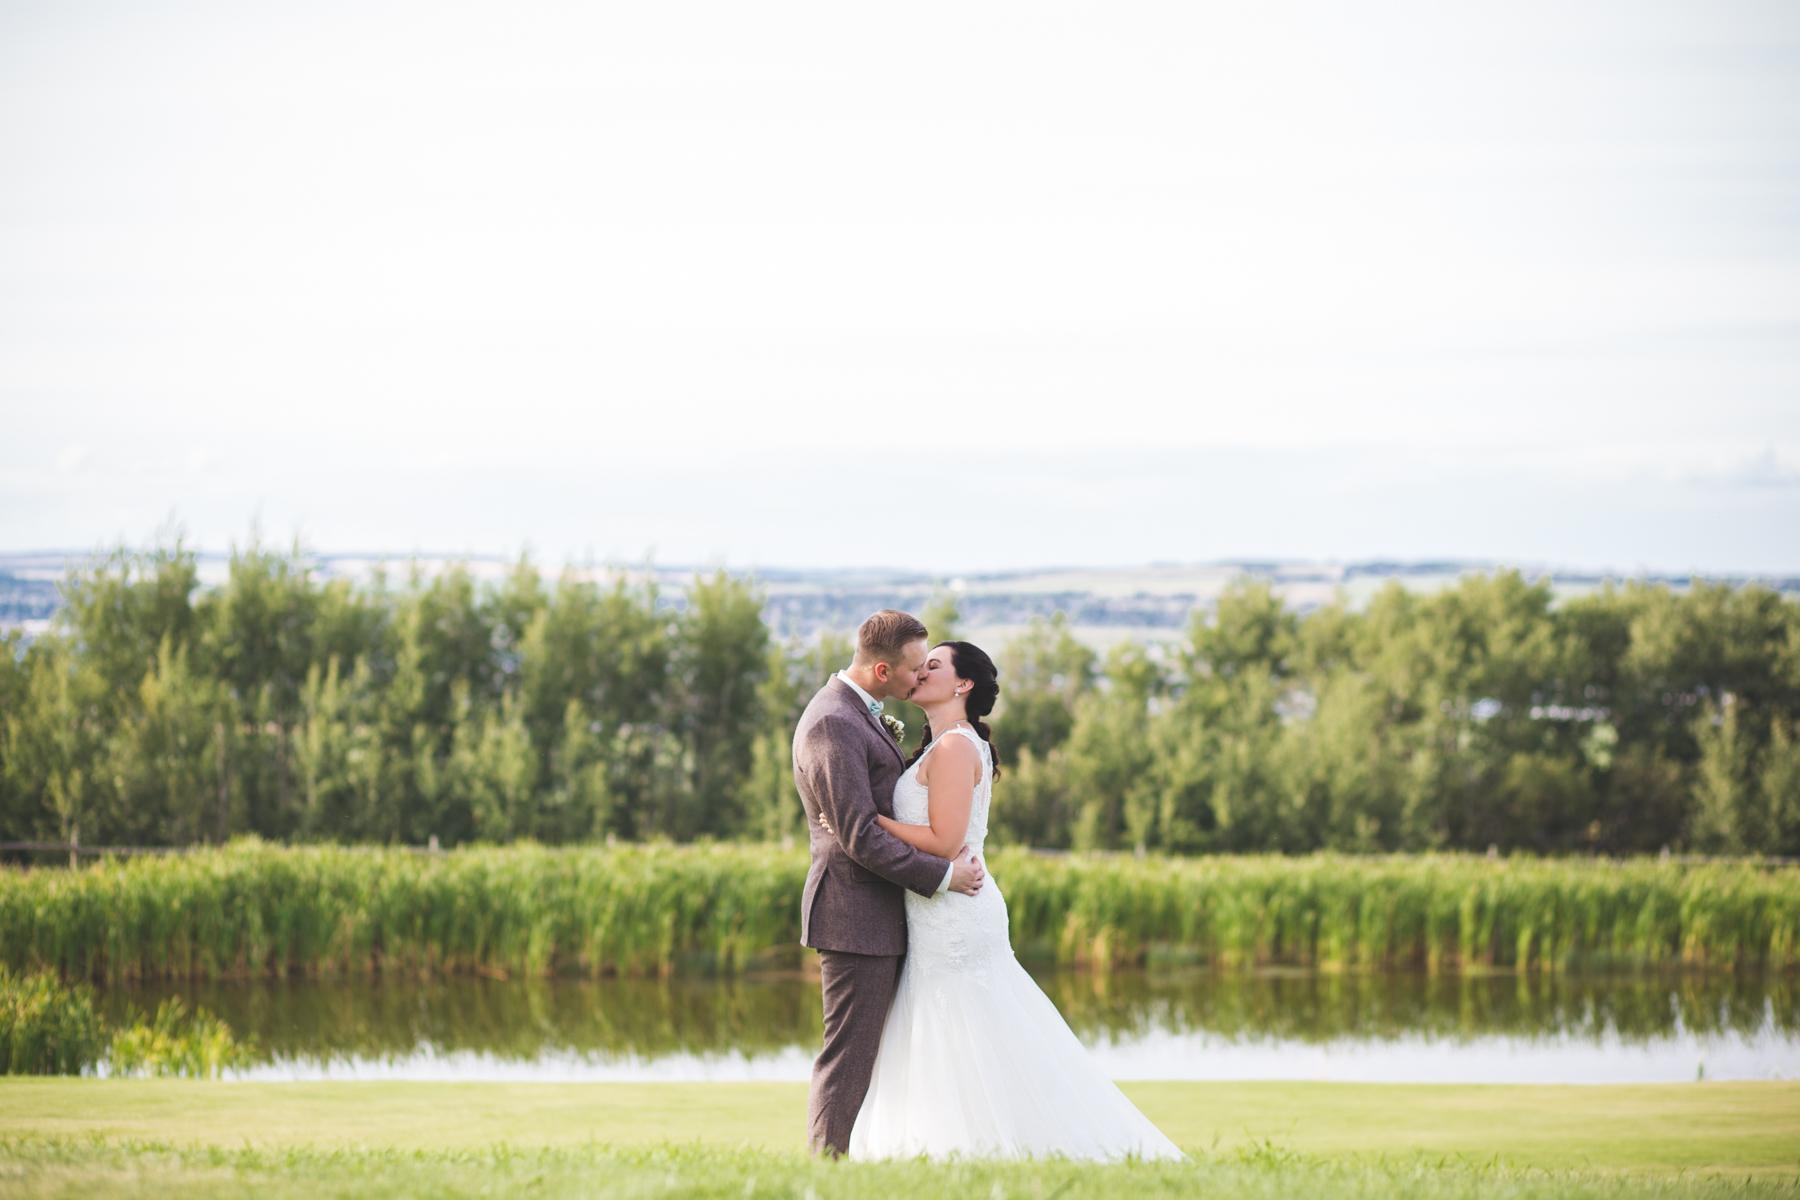 20150808-oglovewedding-9.jpg